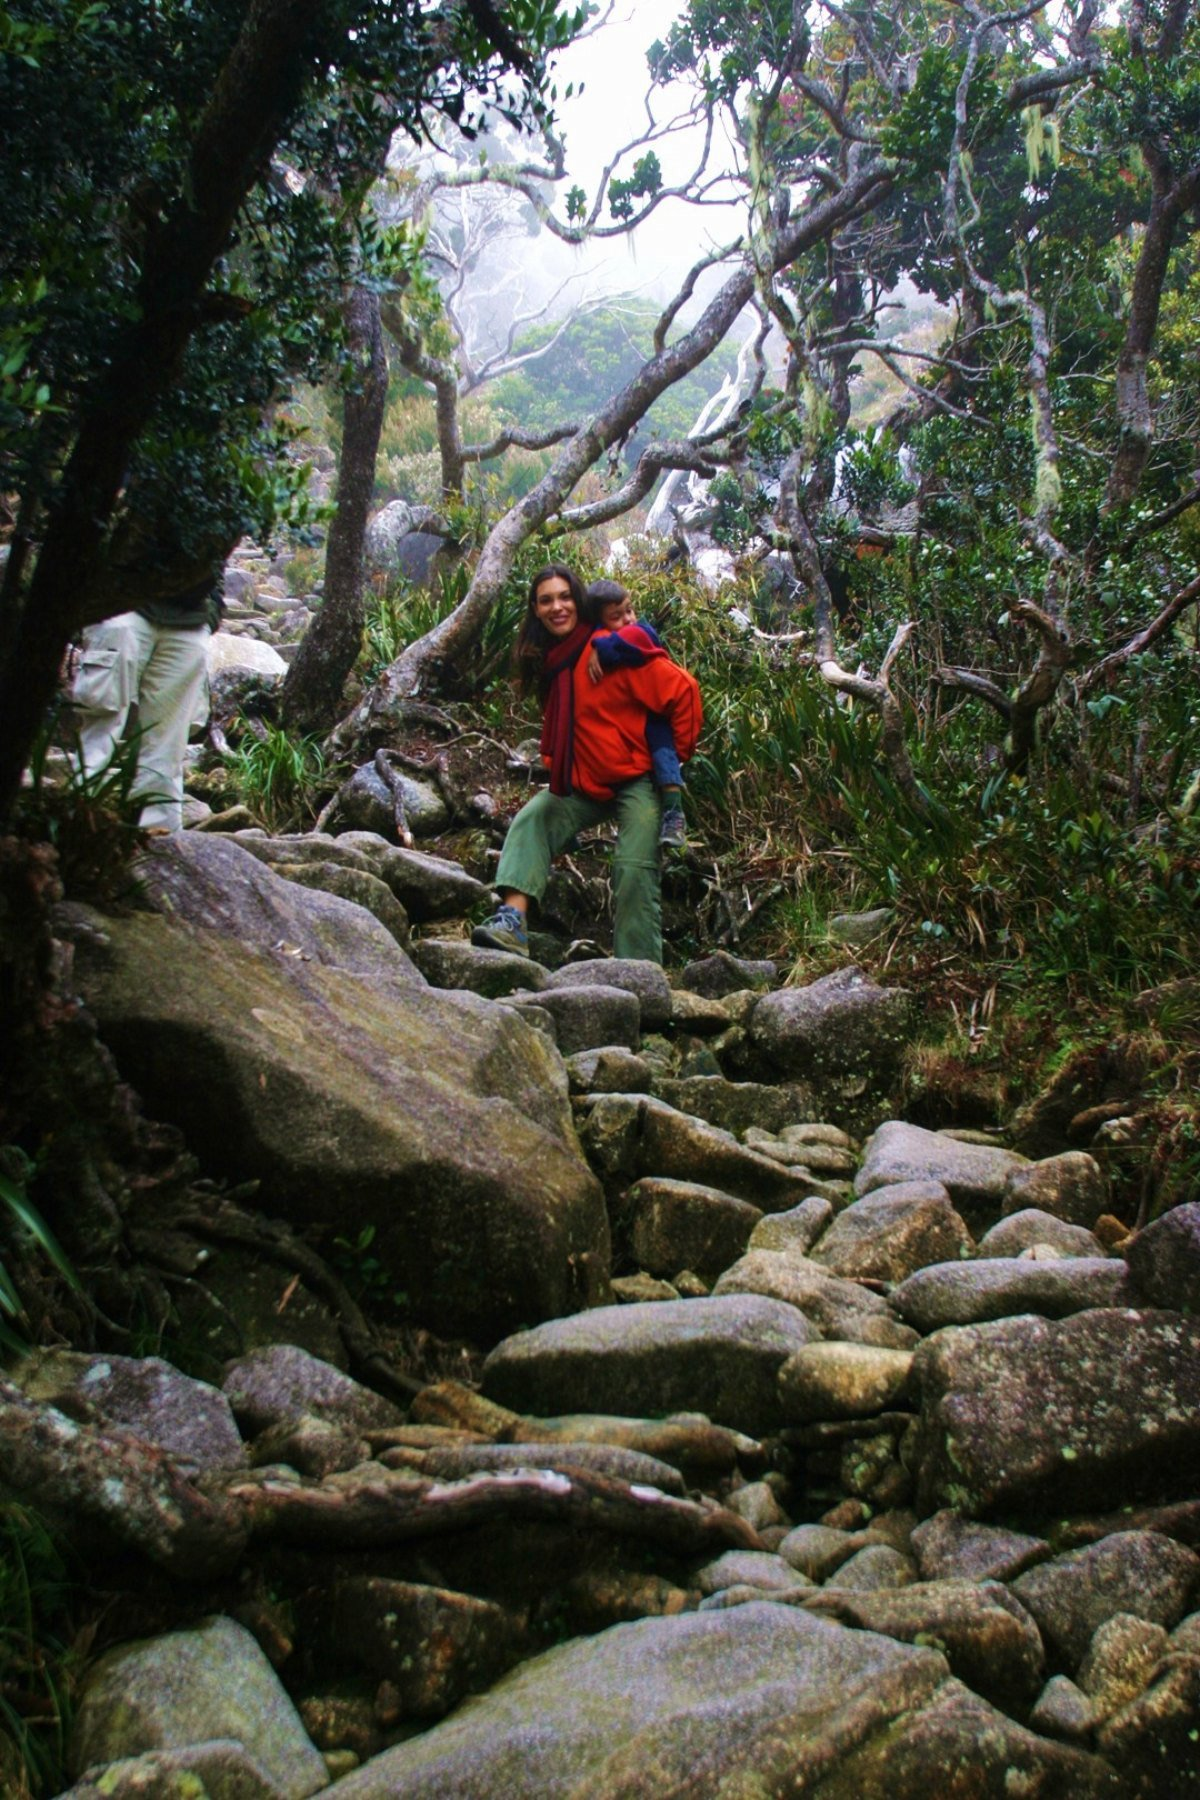 mt-_kinabalu_climb_down_ld_on_back_resized10-17-2011